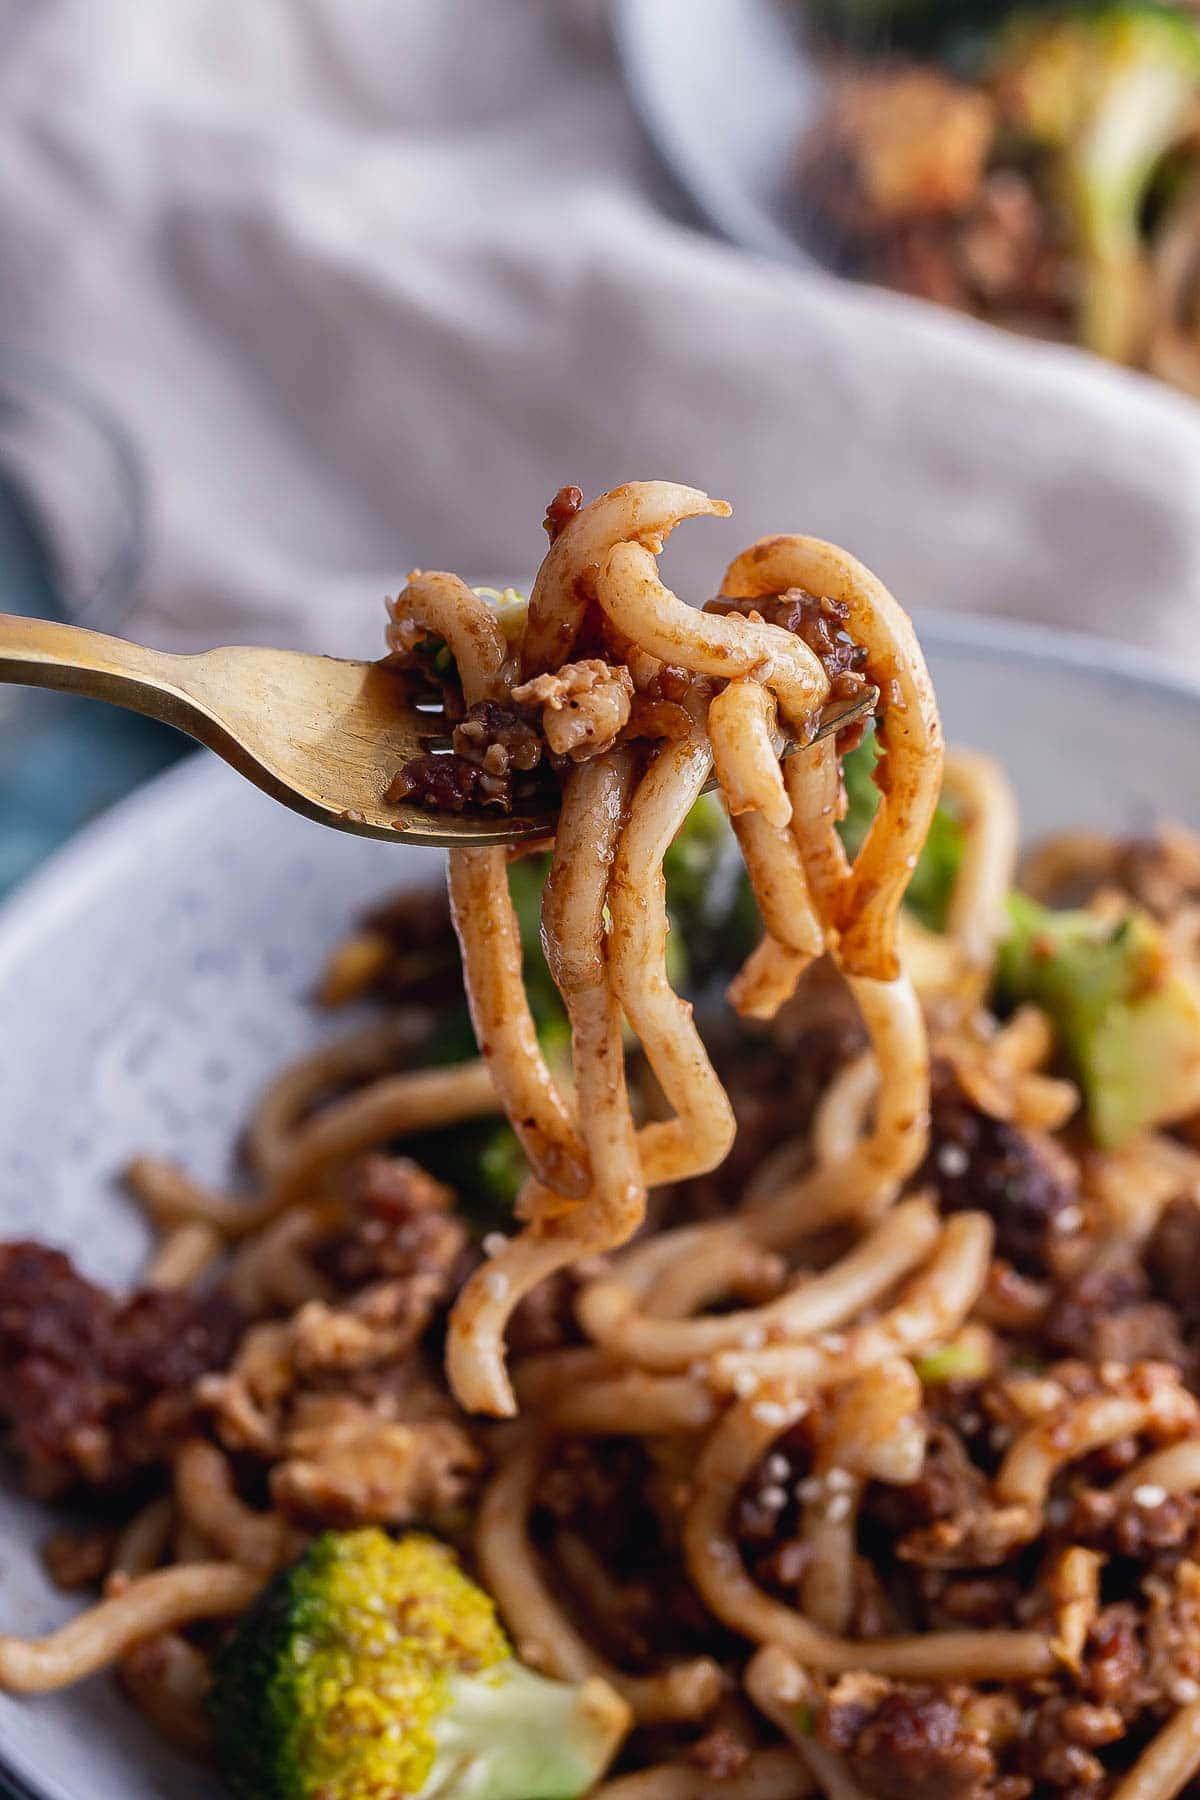 Bowl of egg fried noodles with a gold fork holding noodles